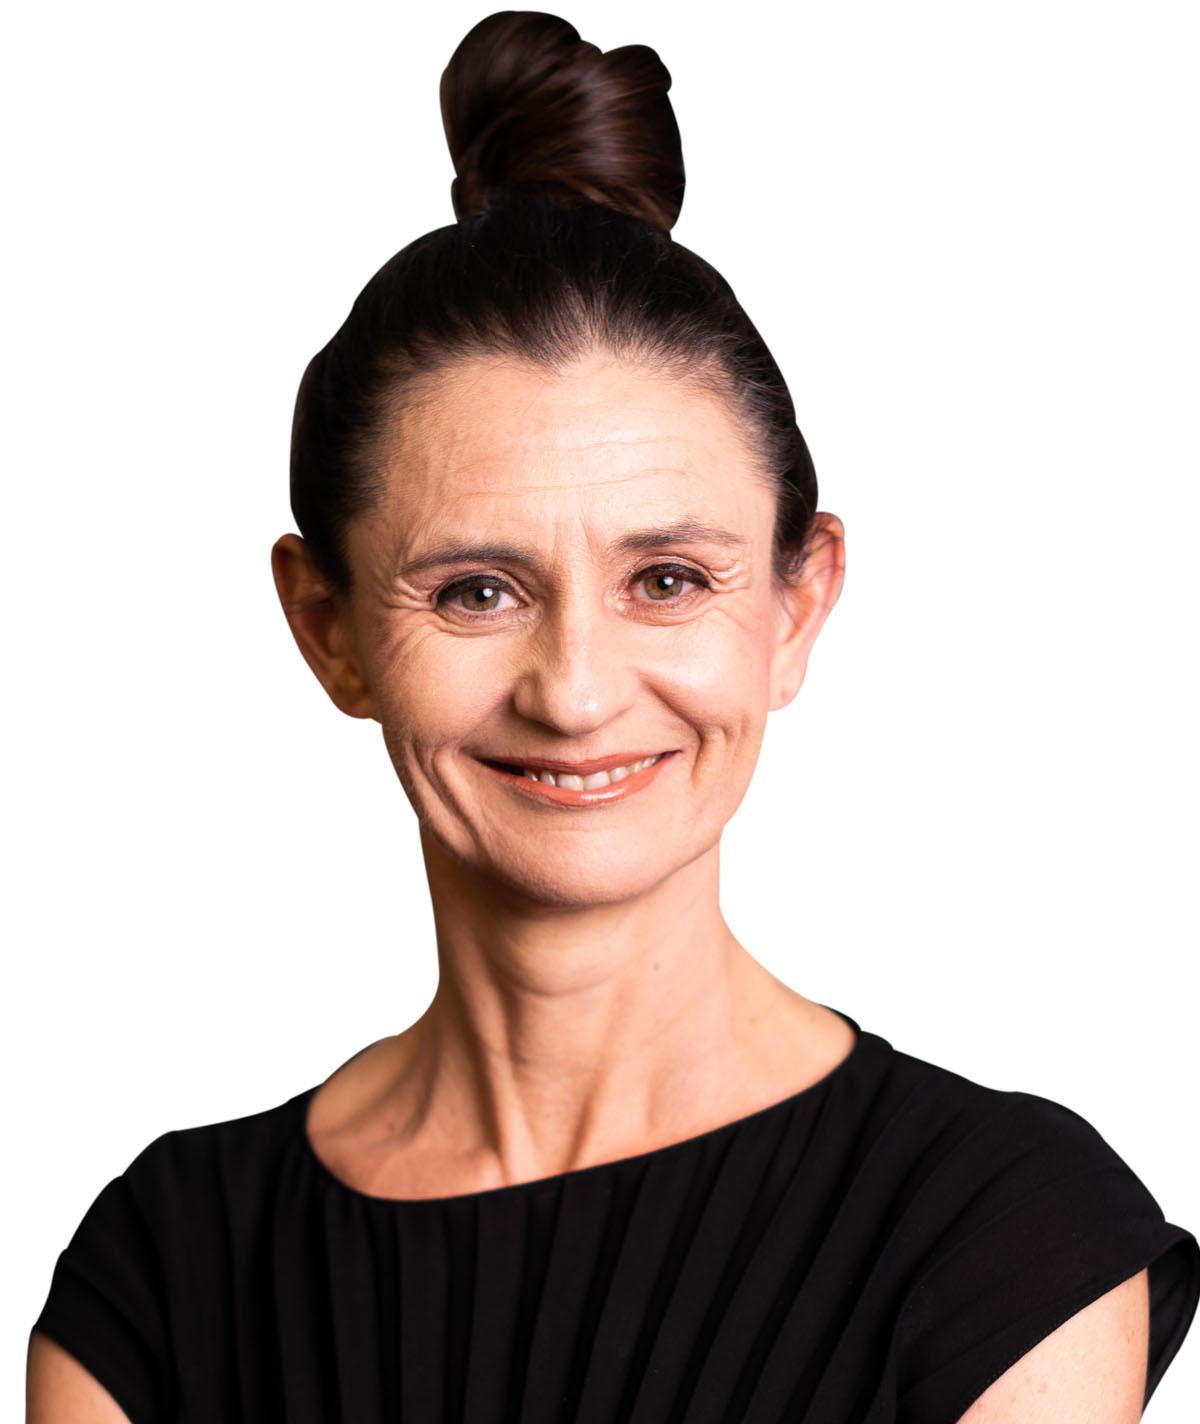 Lindsey McMurray